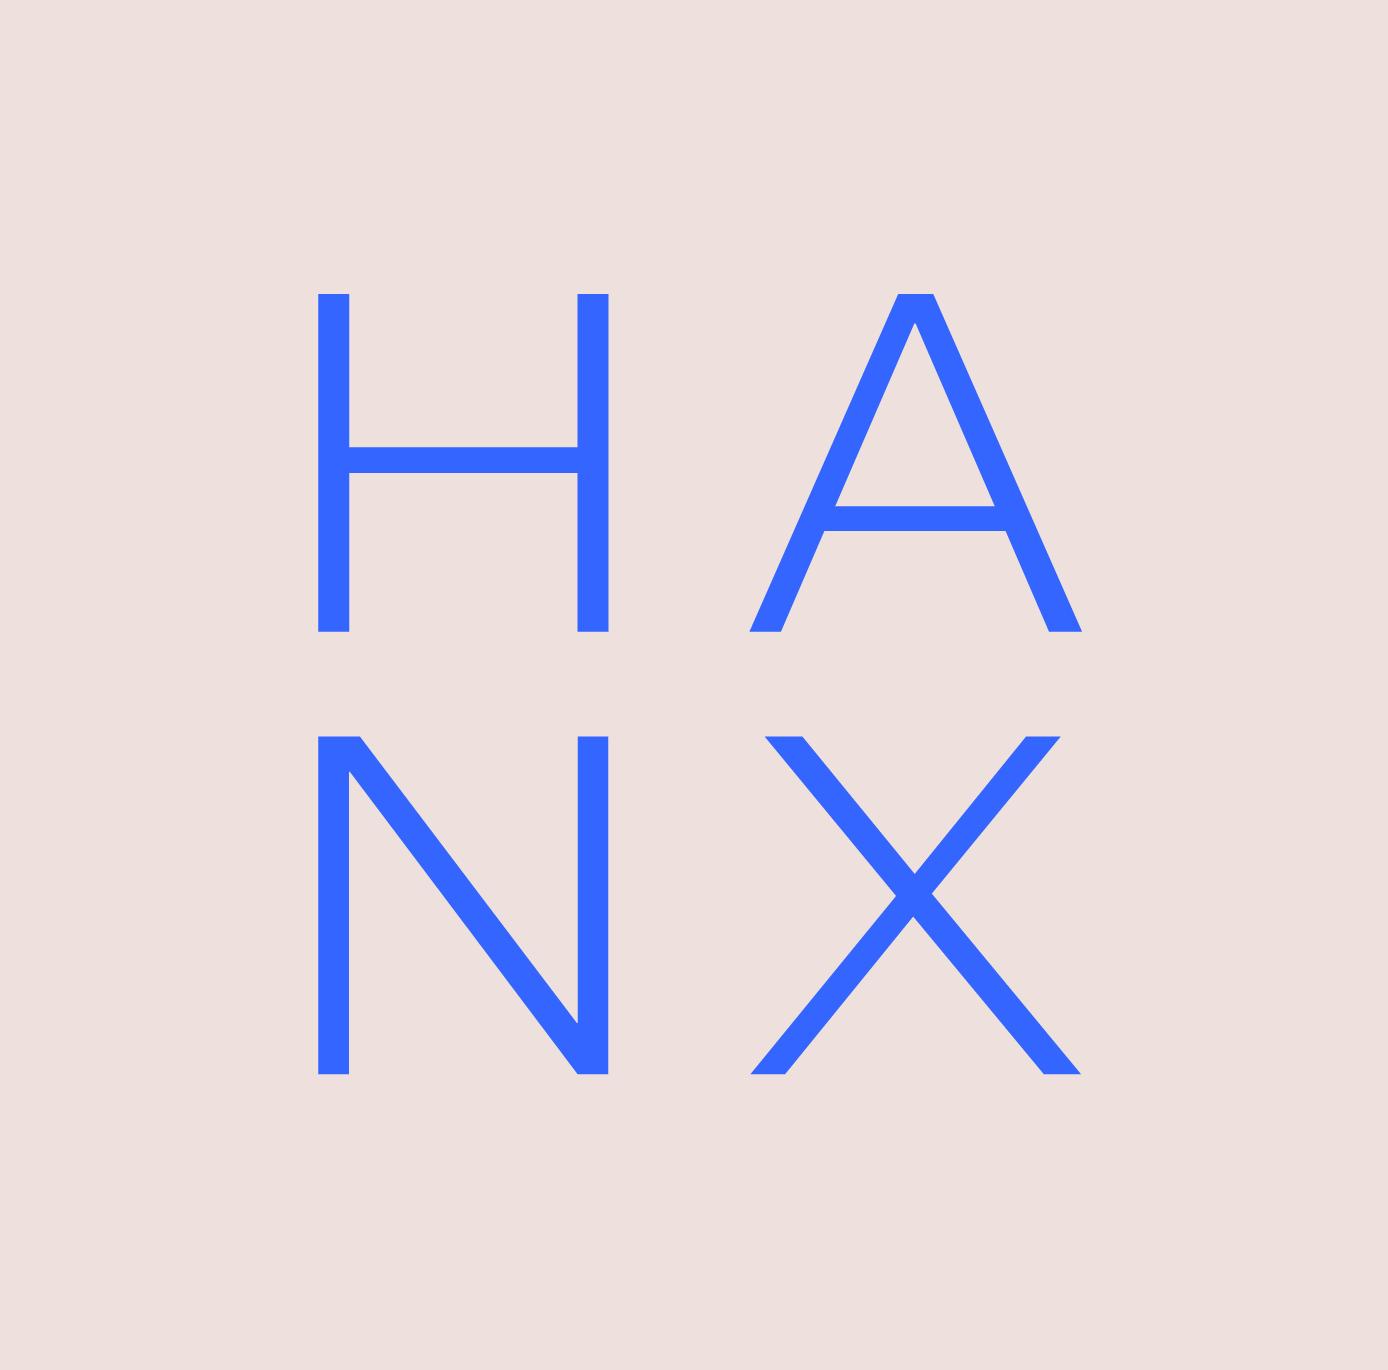 Hanx_Logo_square-01-1